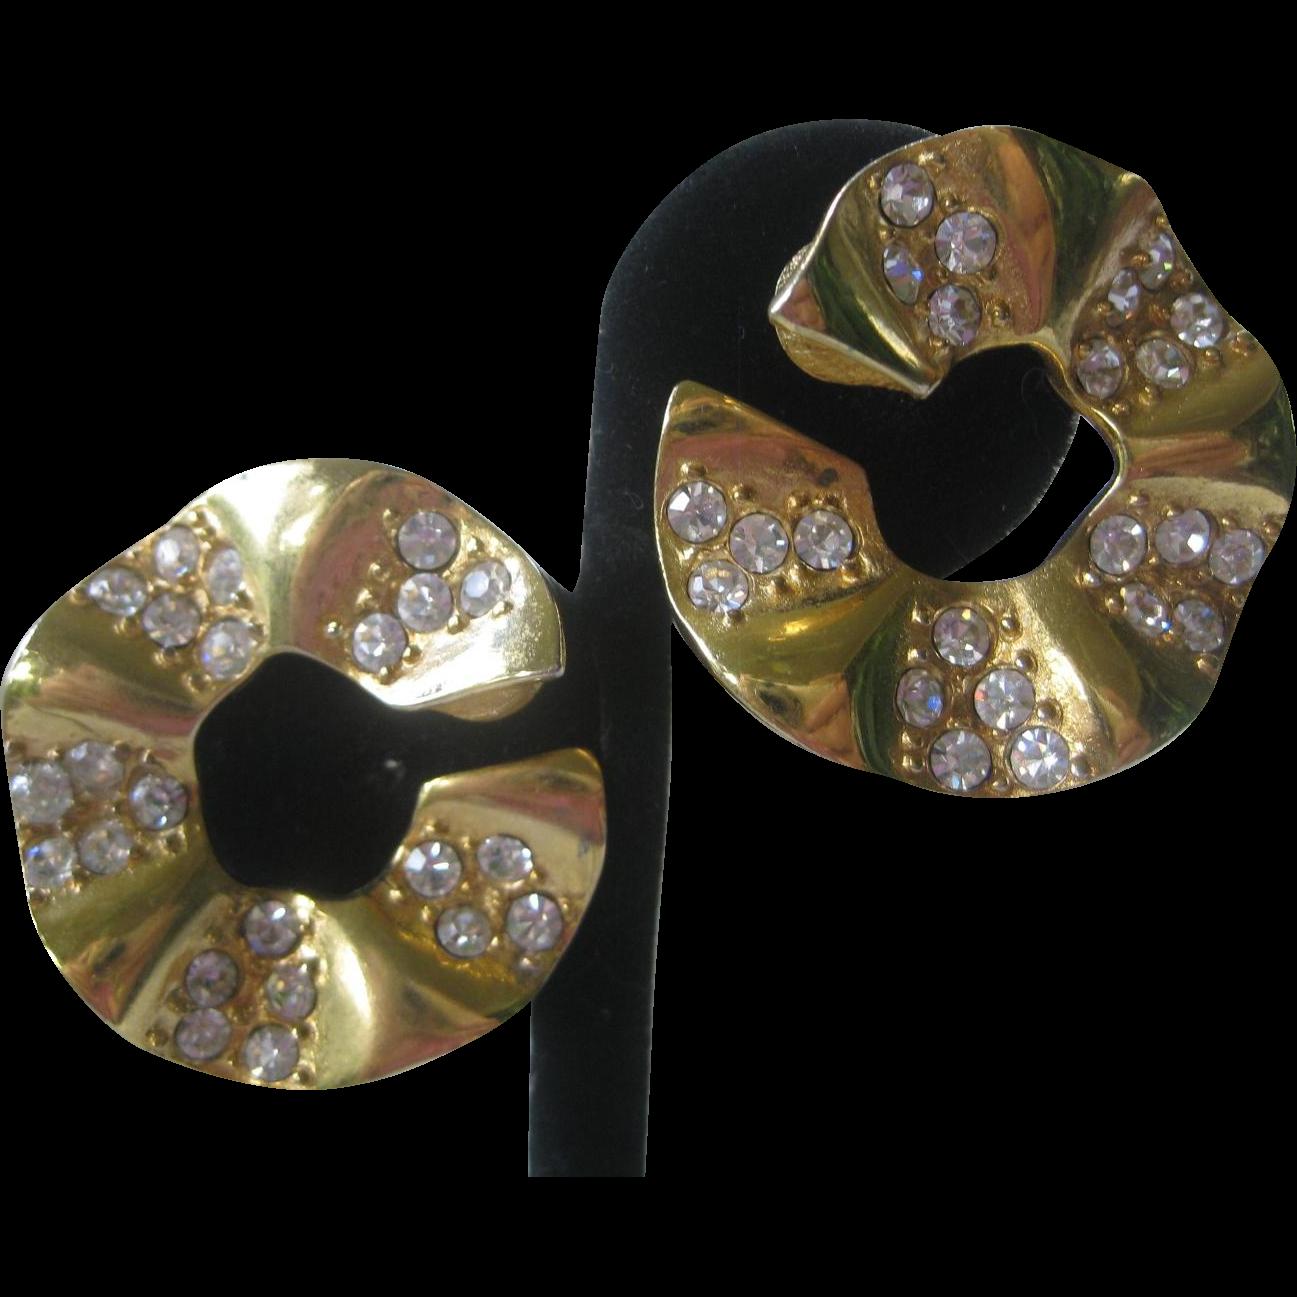 GIVENCHY Ruffled Gold & Rhinestones Earrings